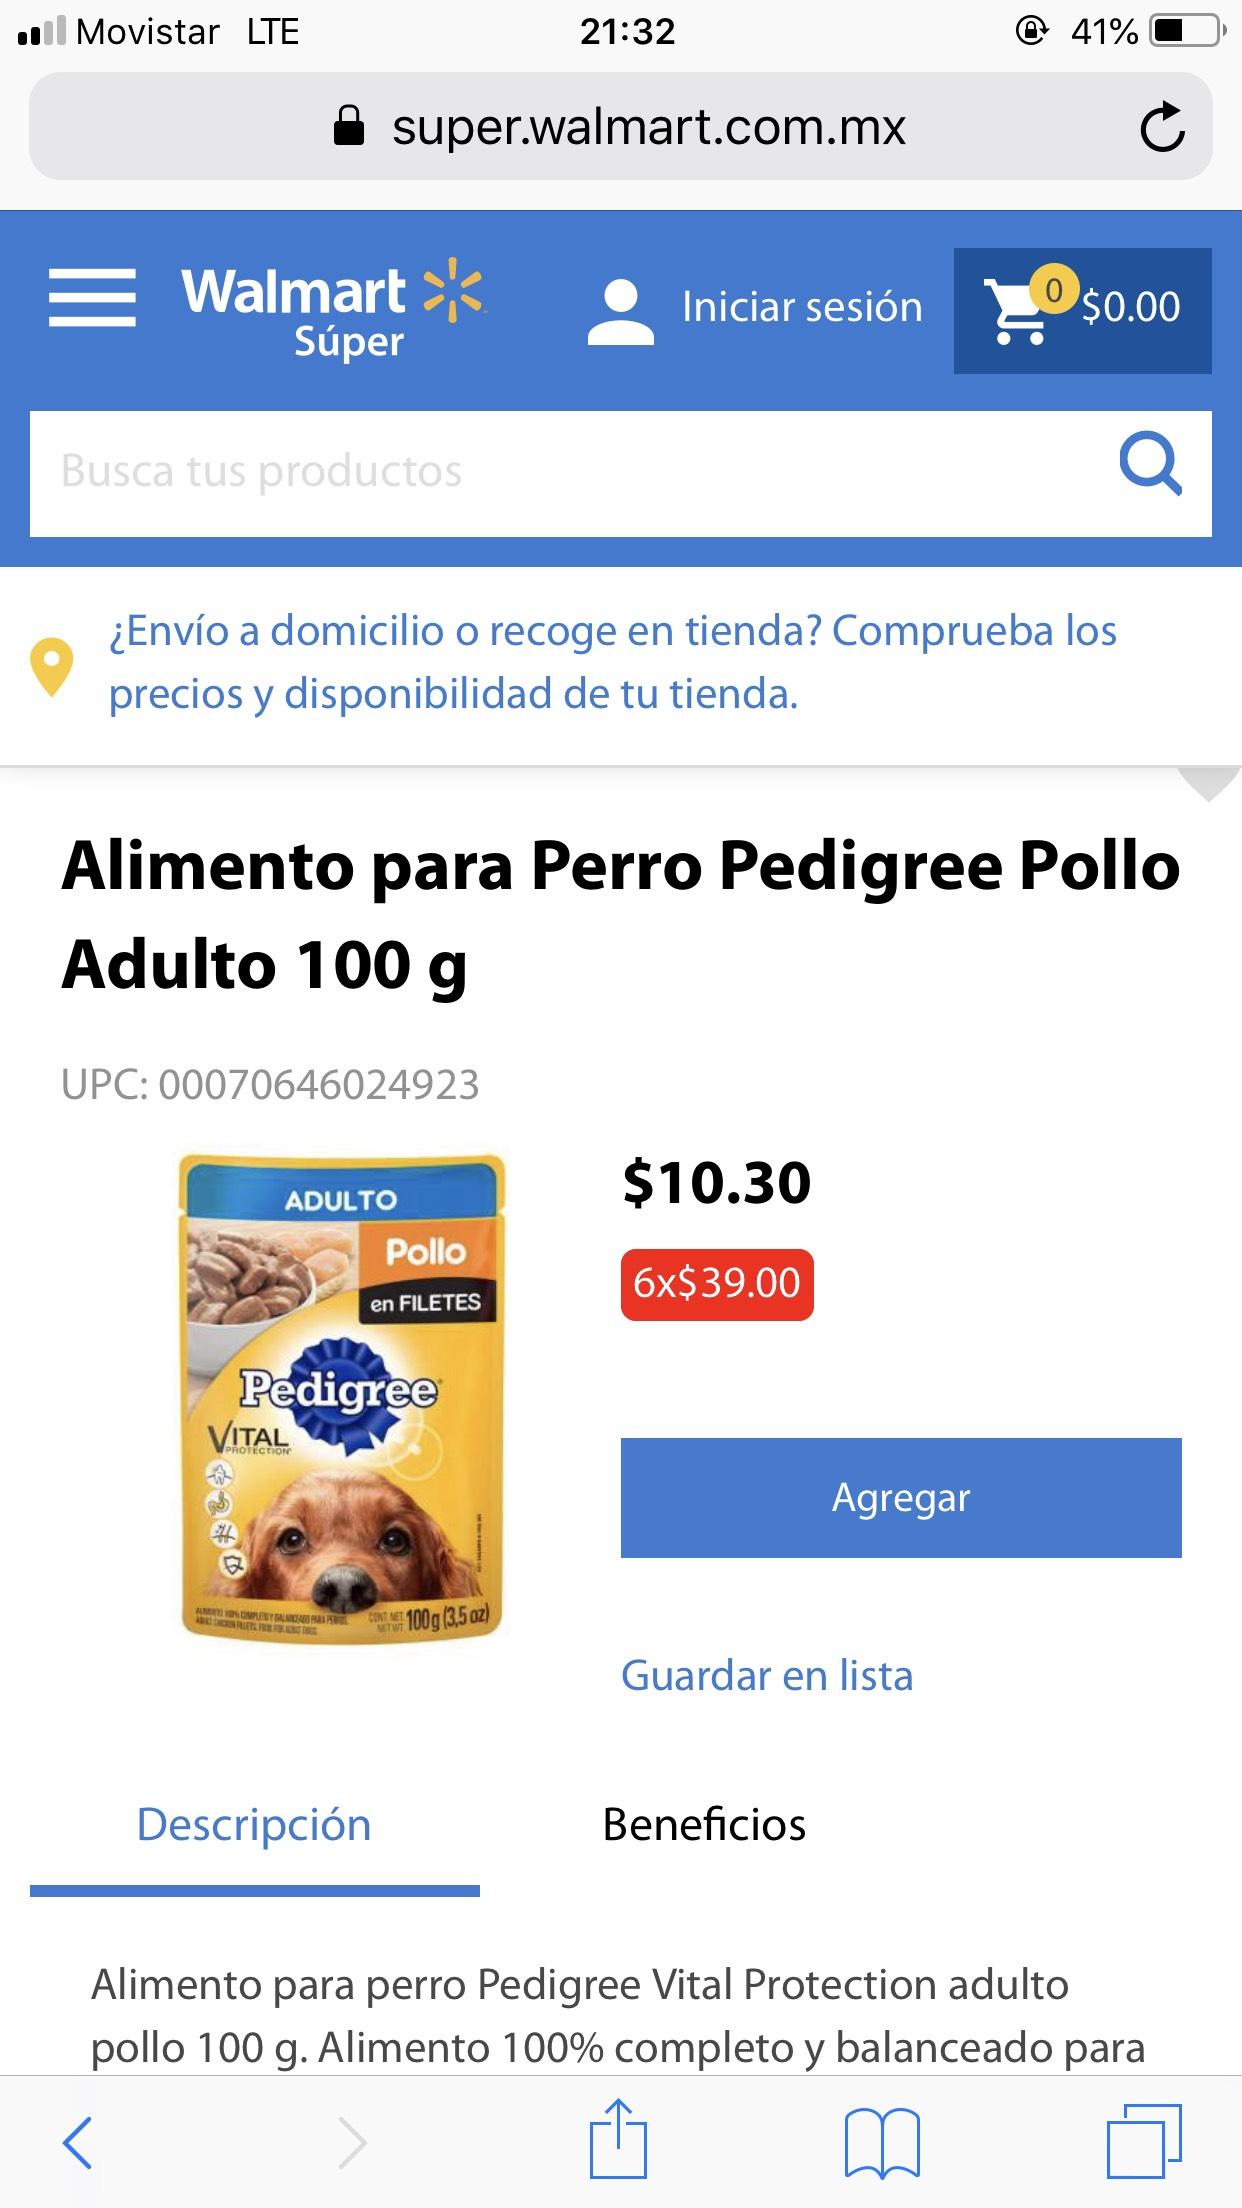 Walmart Súper:  Alimento para perros Pedigree, 6 sobres x $39